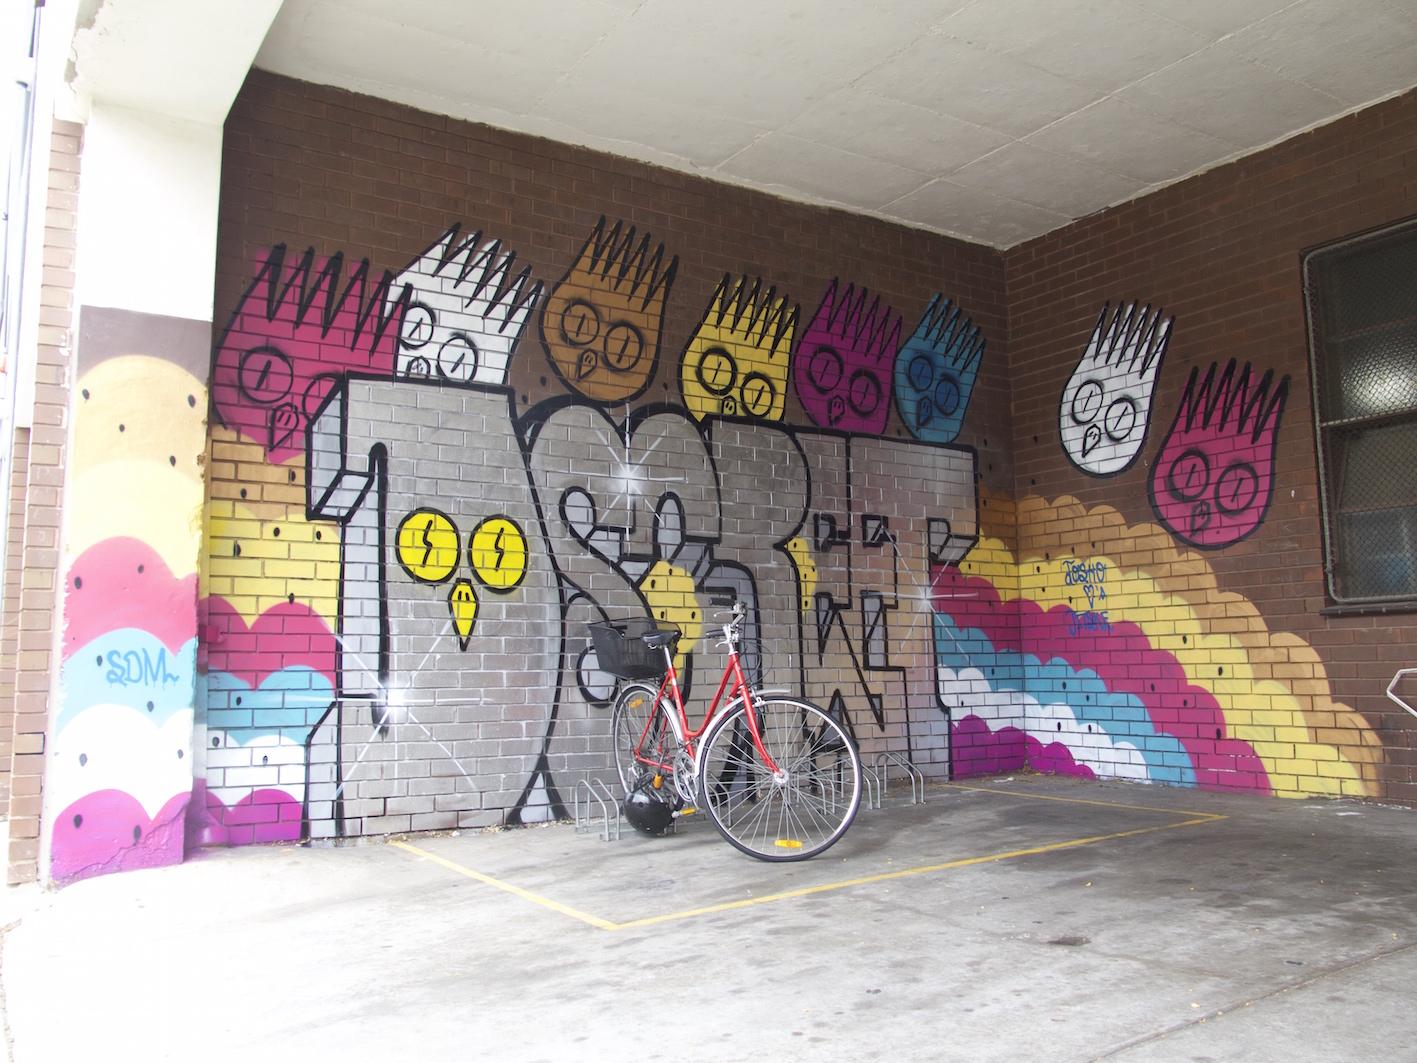 deansunshine_landofsunshine_melbourne_streetart_graffiti_invurt top ten 46 2. Dscreet